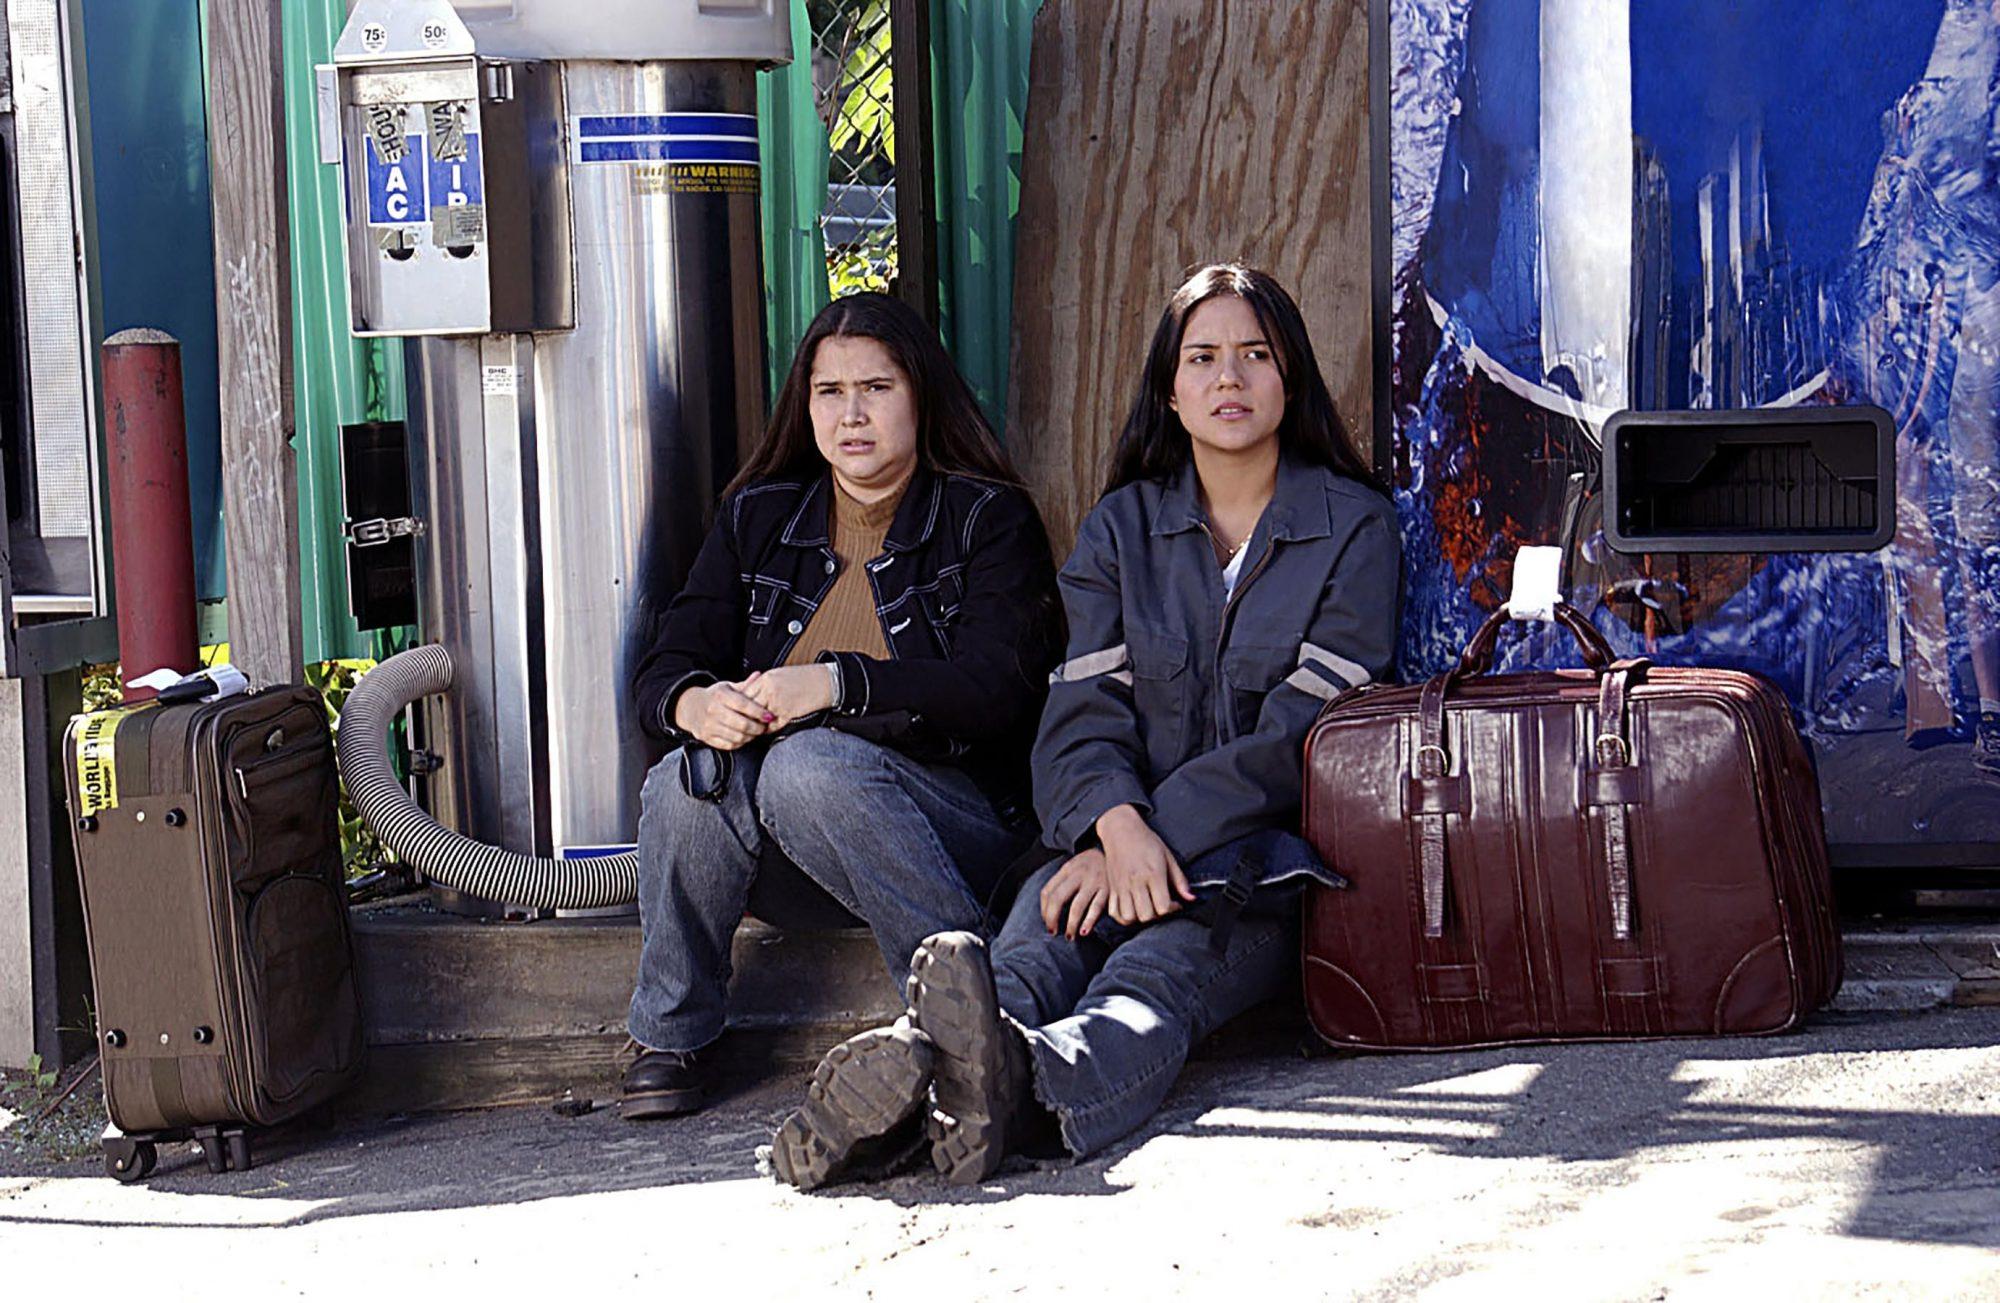 MARIA FULL OF GRACE, (aka LLENA ERES DE GRACIA), Yenny Paola Vega Sanchez, Catalina Sandino Moreno,